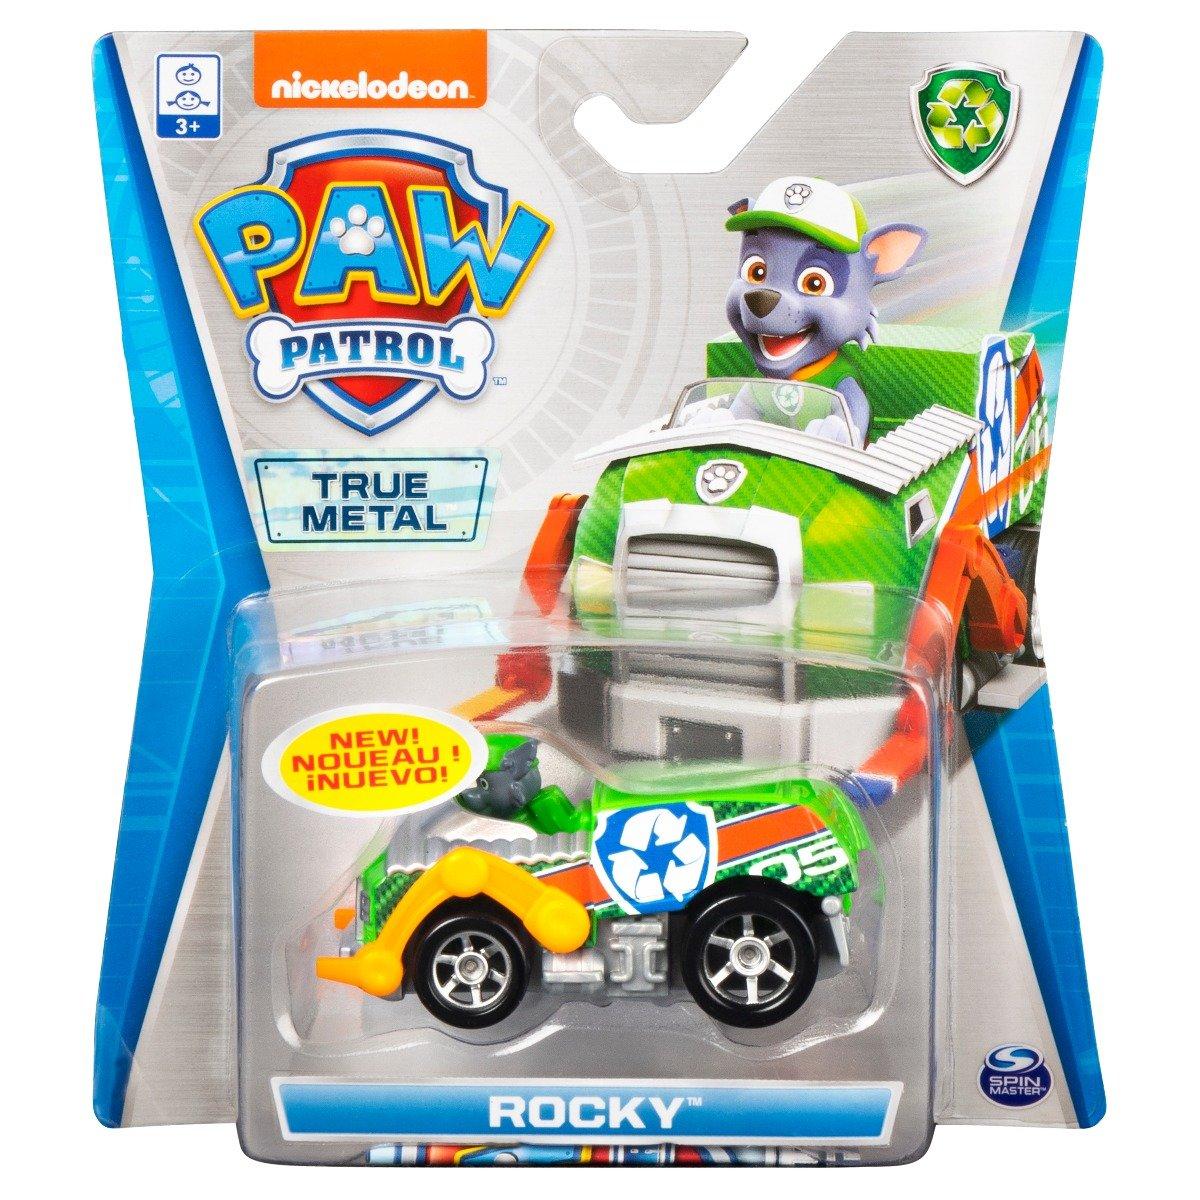 Masinuta cu figurina Paw Patrol True Metal, Rocky 20121334